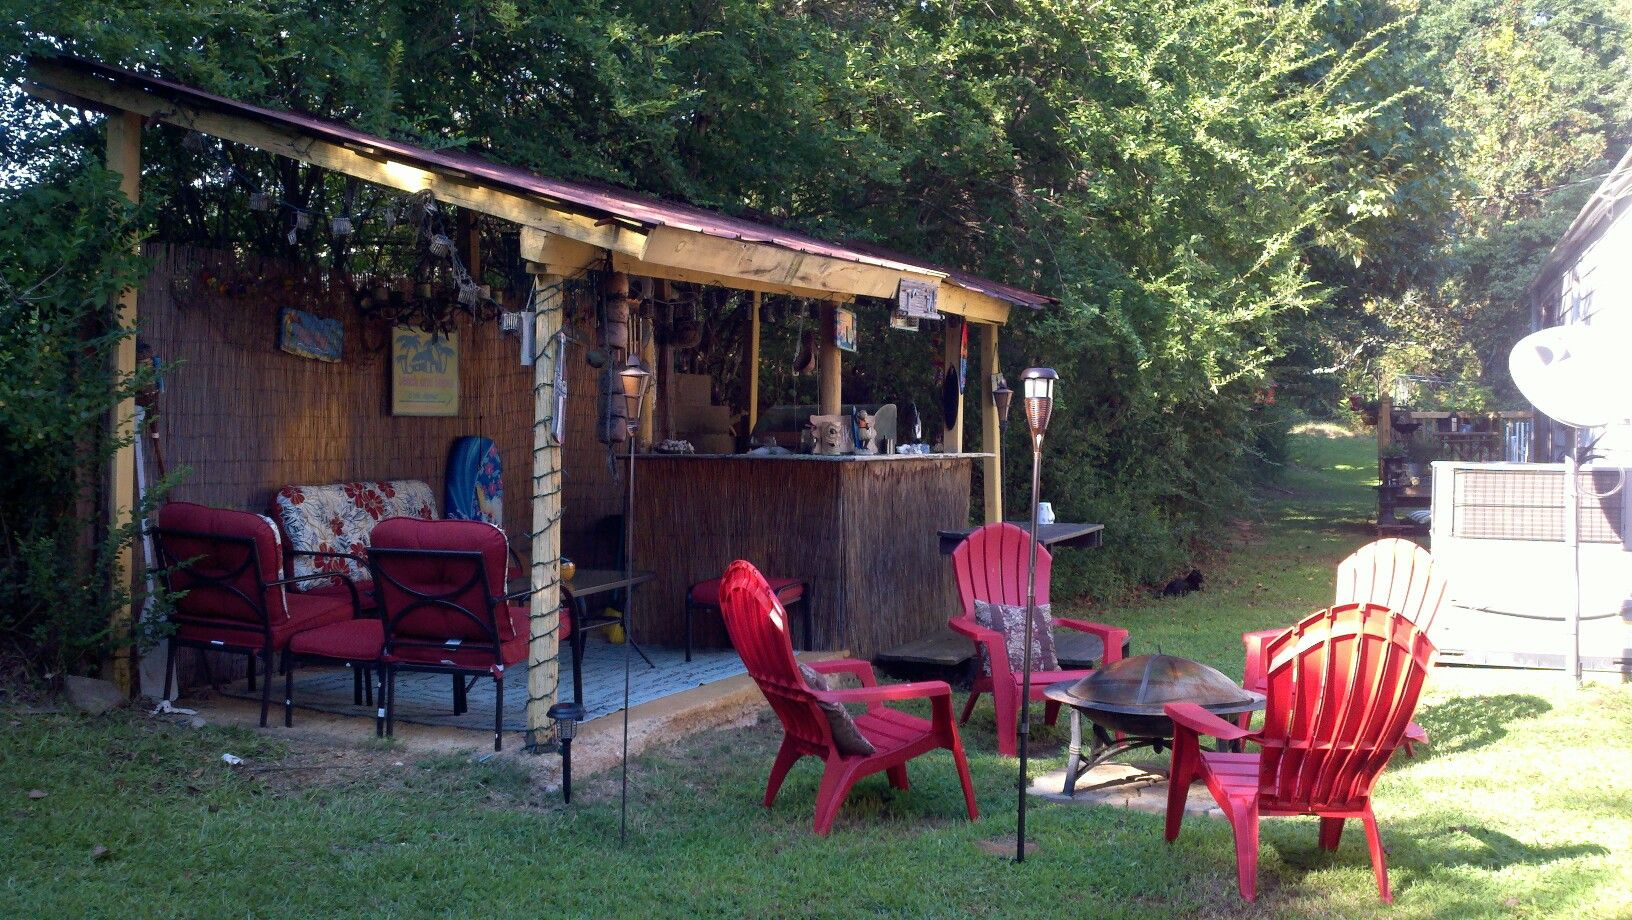 Backyard tiki hut | Tiki hut, Backyard, Outdoor oasis on Backyard Tiki Hut Designs id=29086